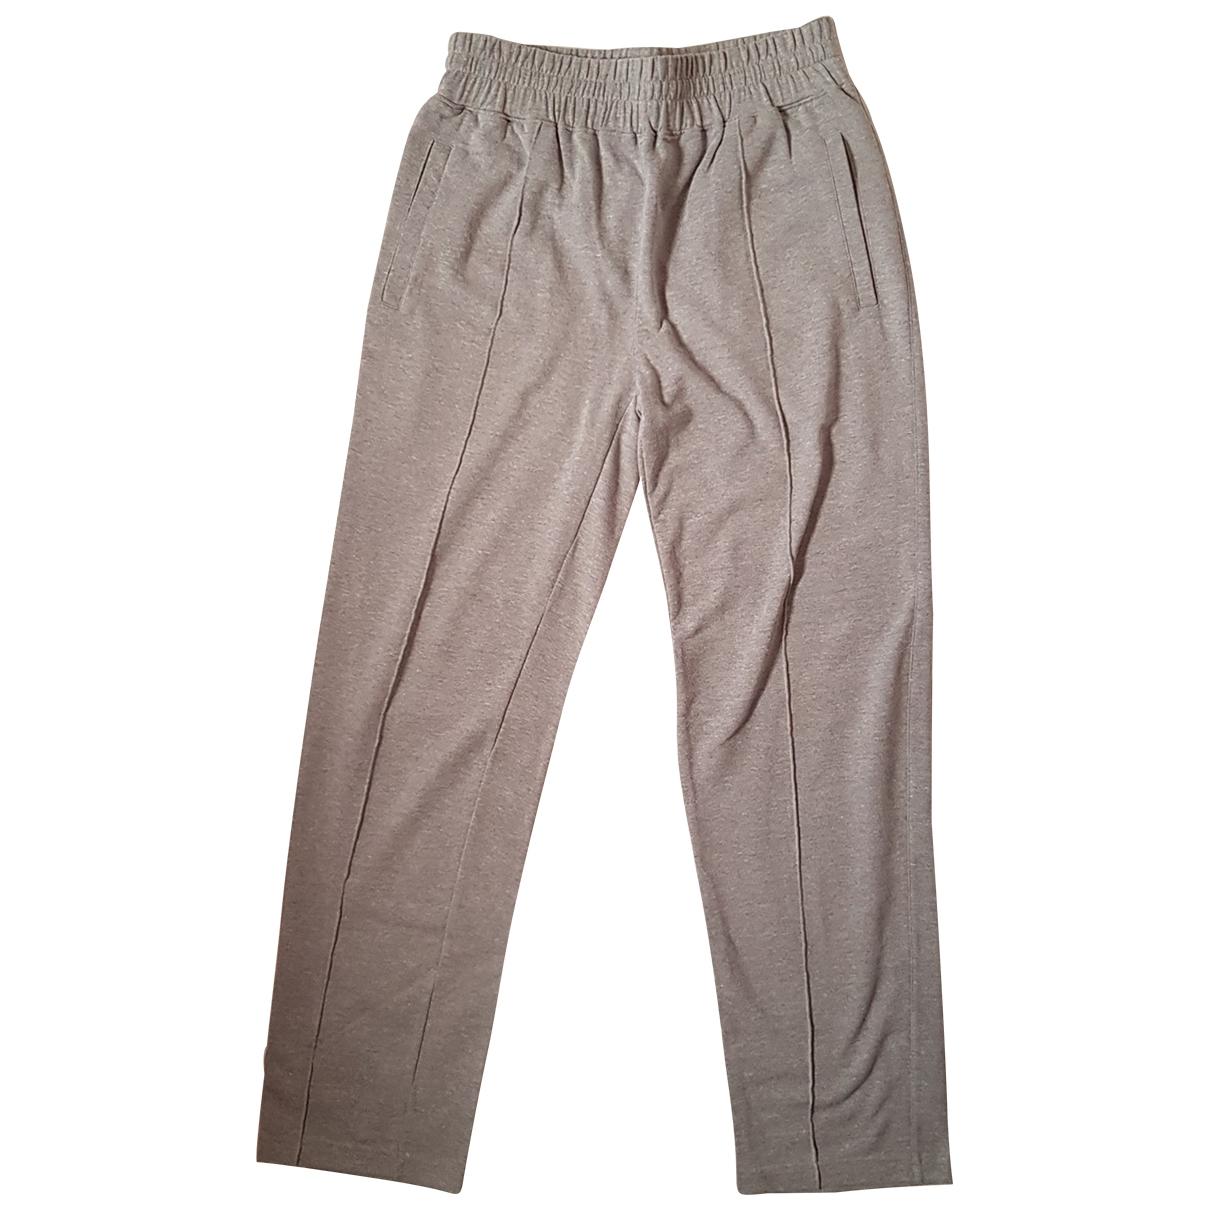 Emporio Armani - Pantalon   pour homme en coton - gris